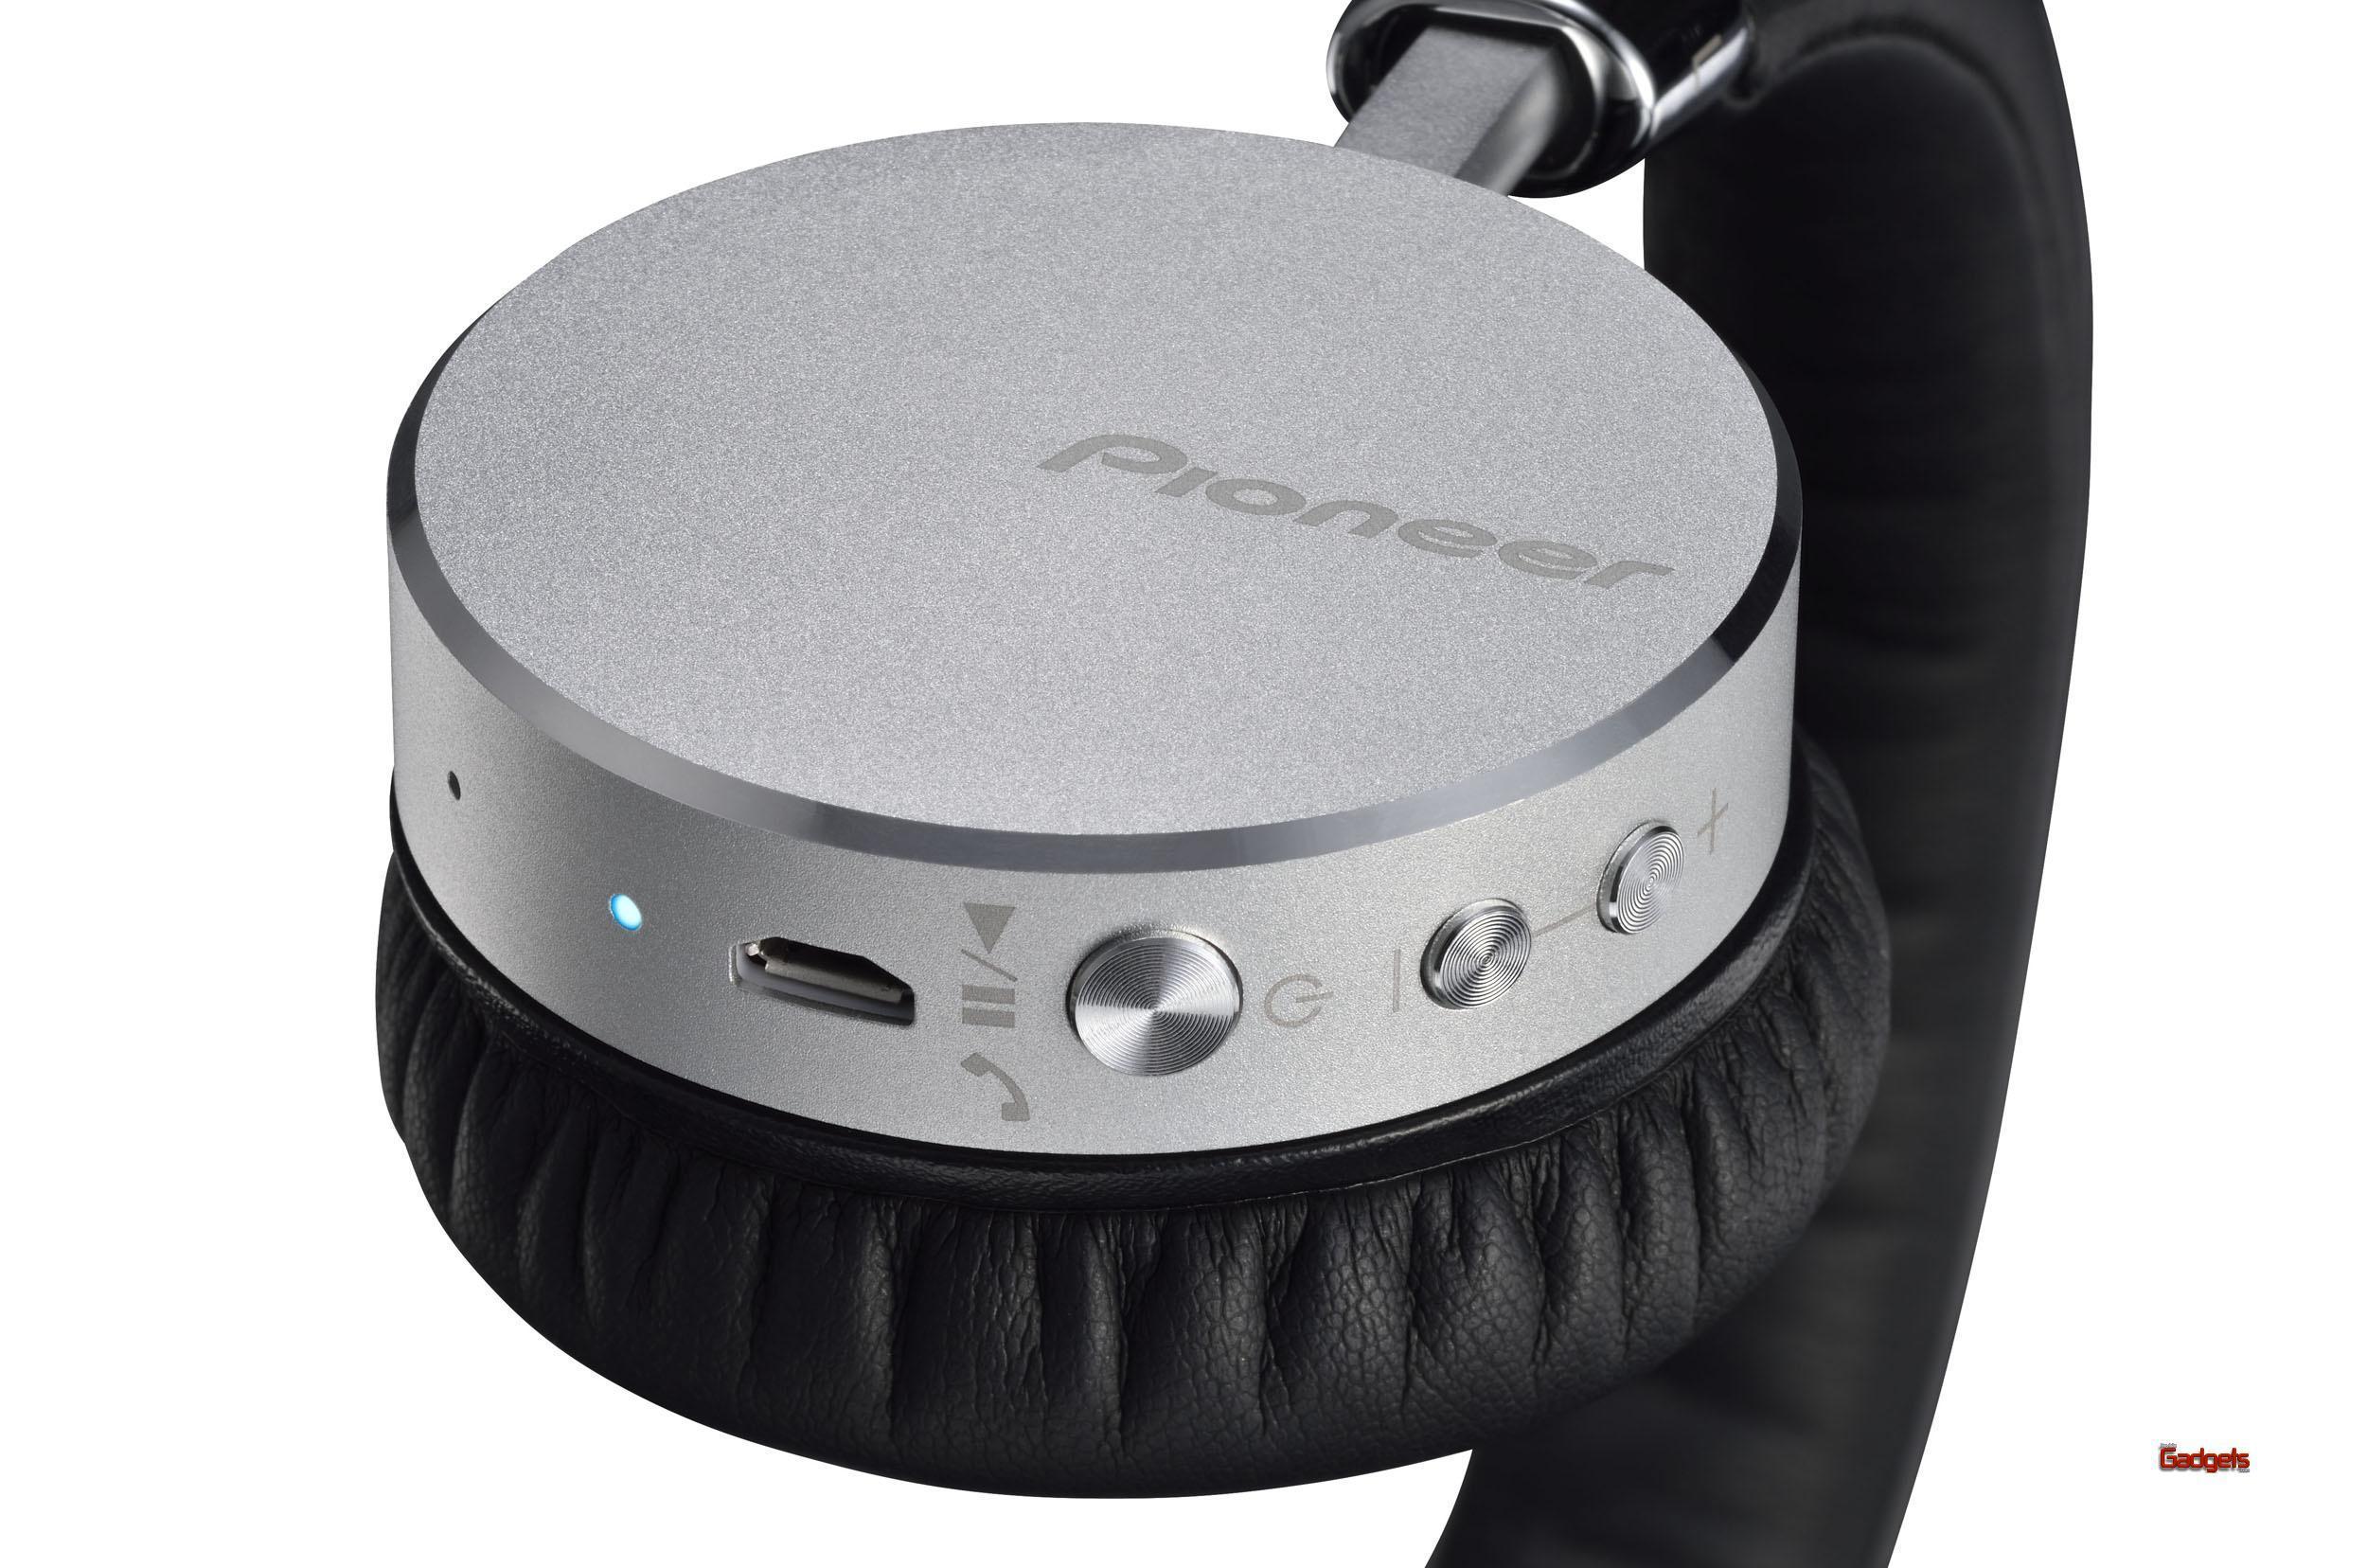 Pioneer-Audifonos-Bluetooth-SE-MJ561BT-04